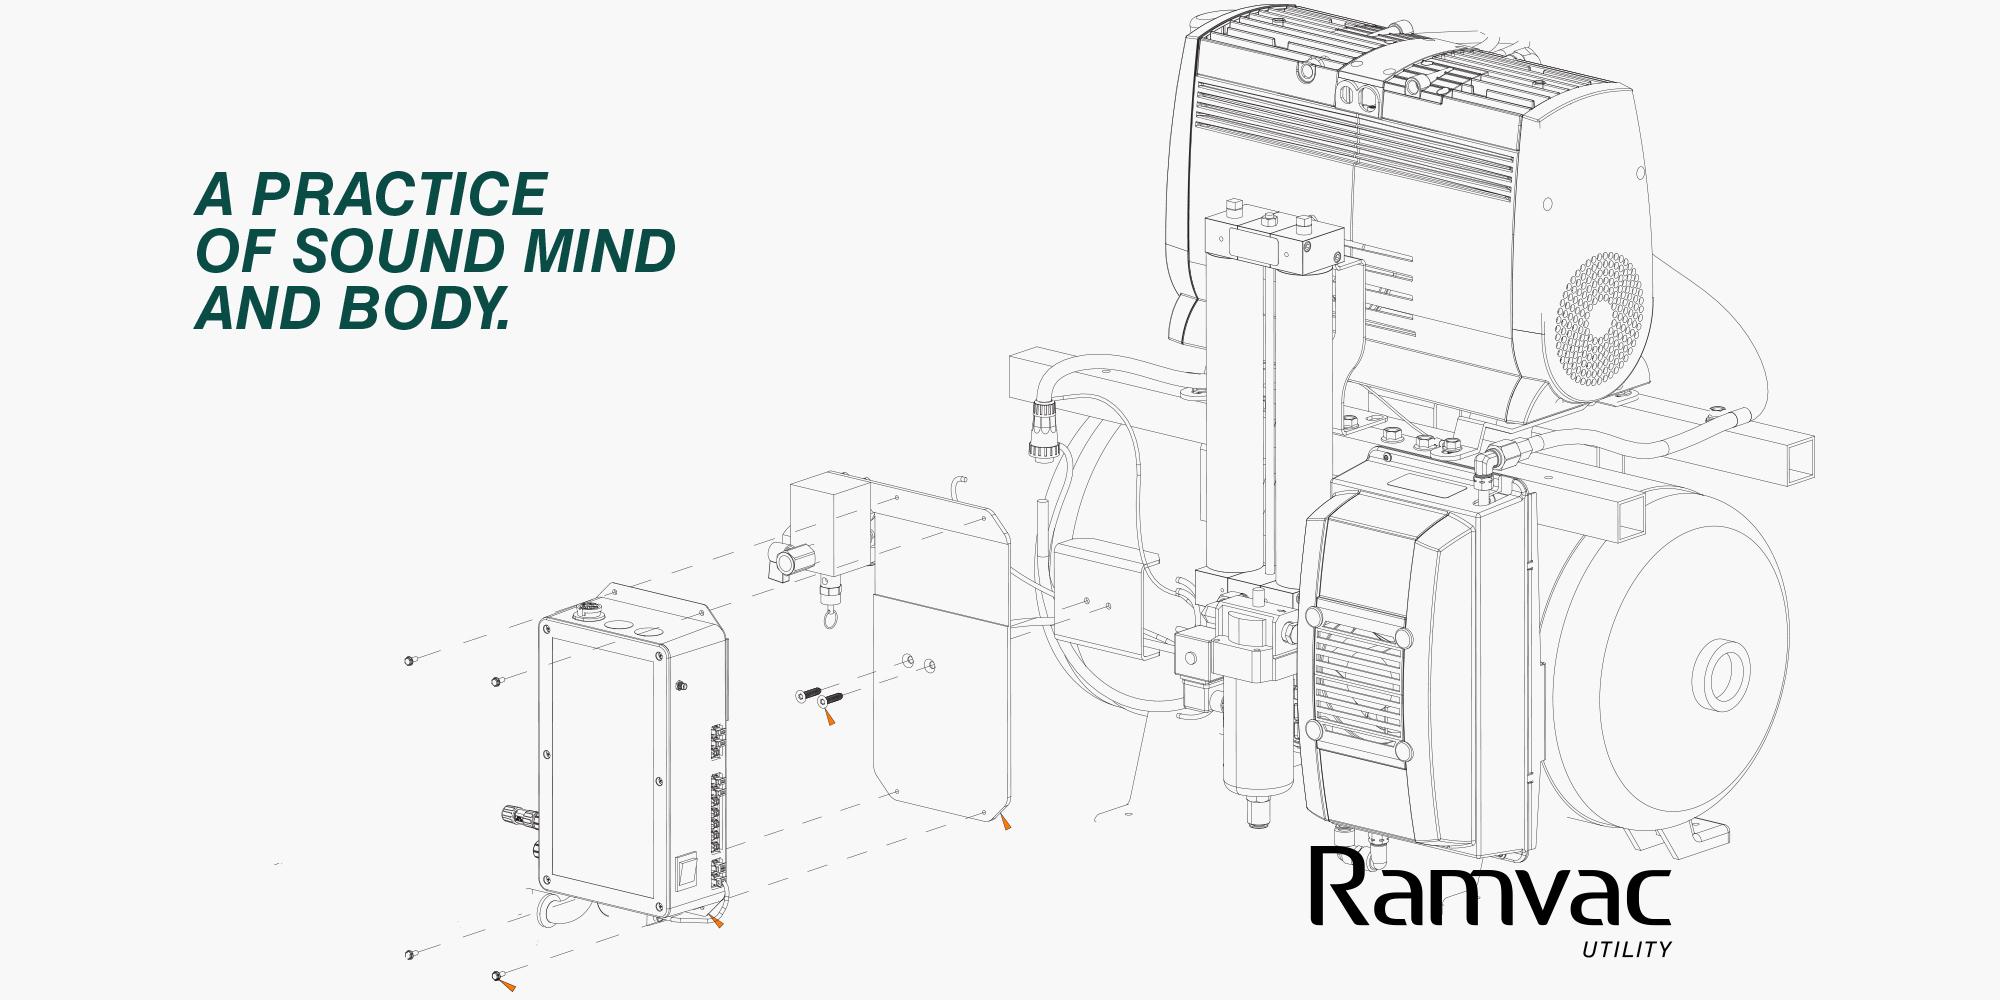 Ramvac Utility